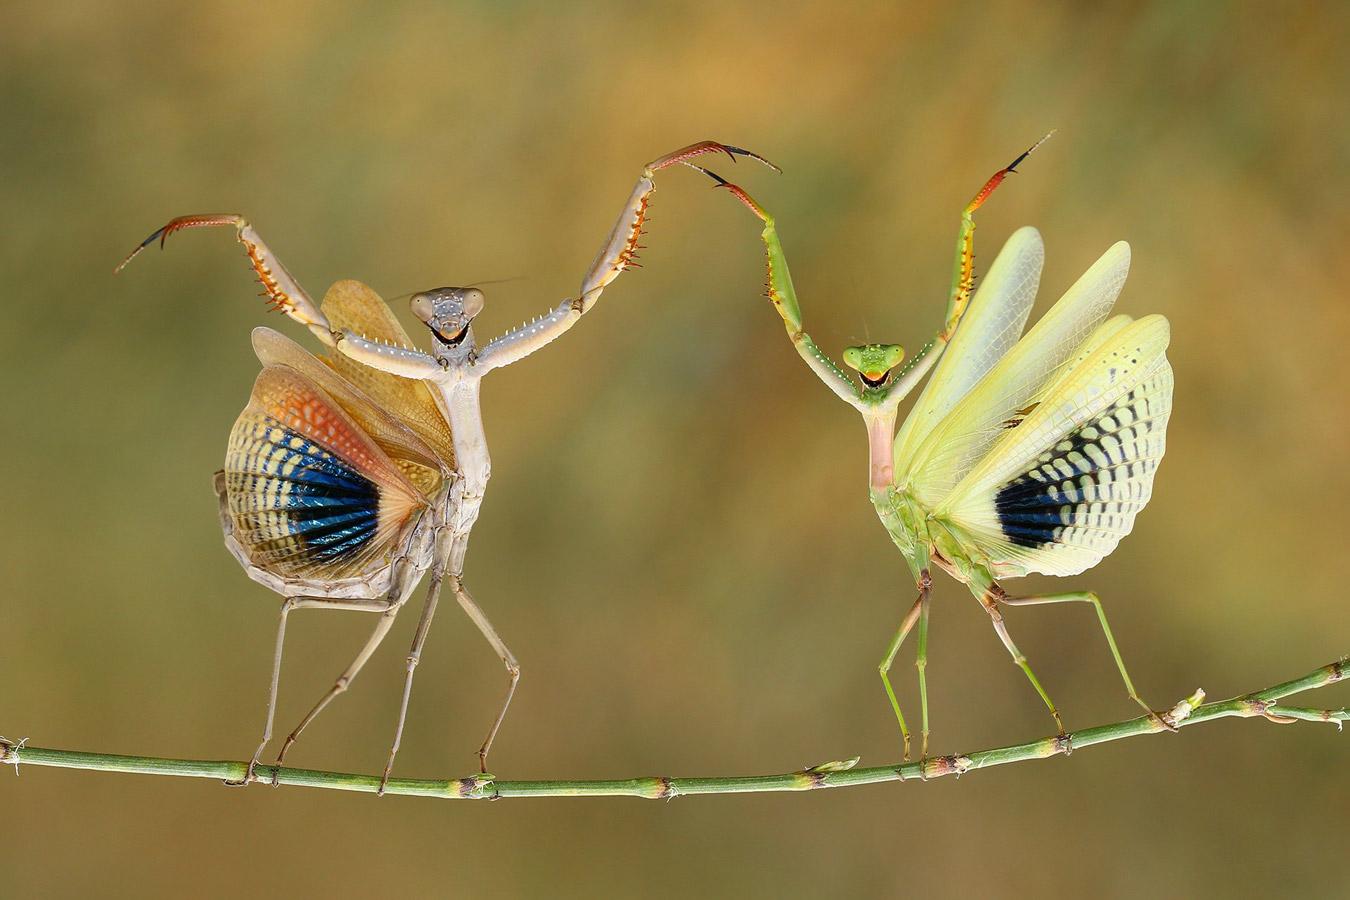 Showtime, © Baglar Hasan, Cyprus, 1st place, TransNatura International Nature Photo Contest